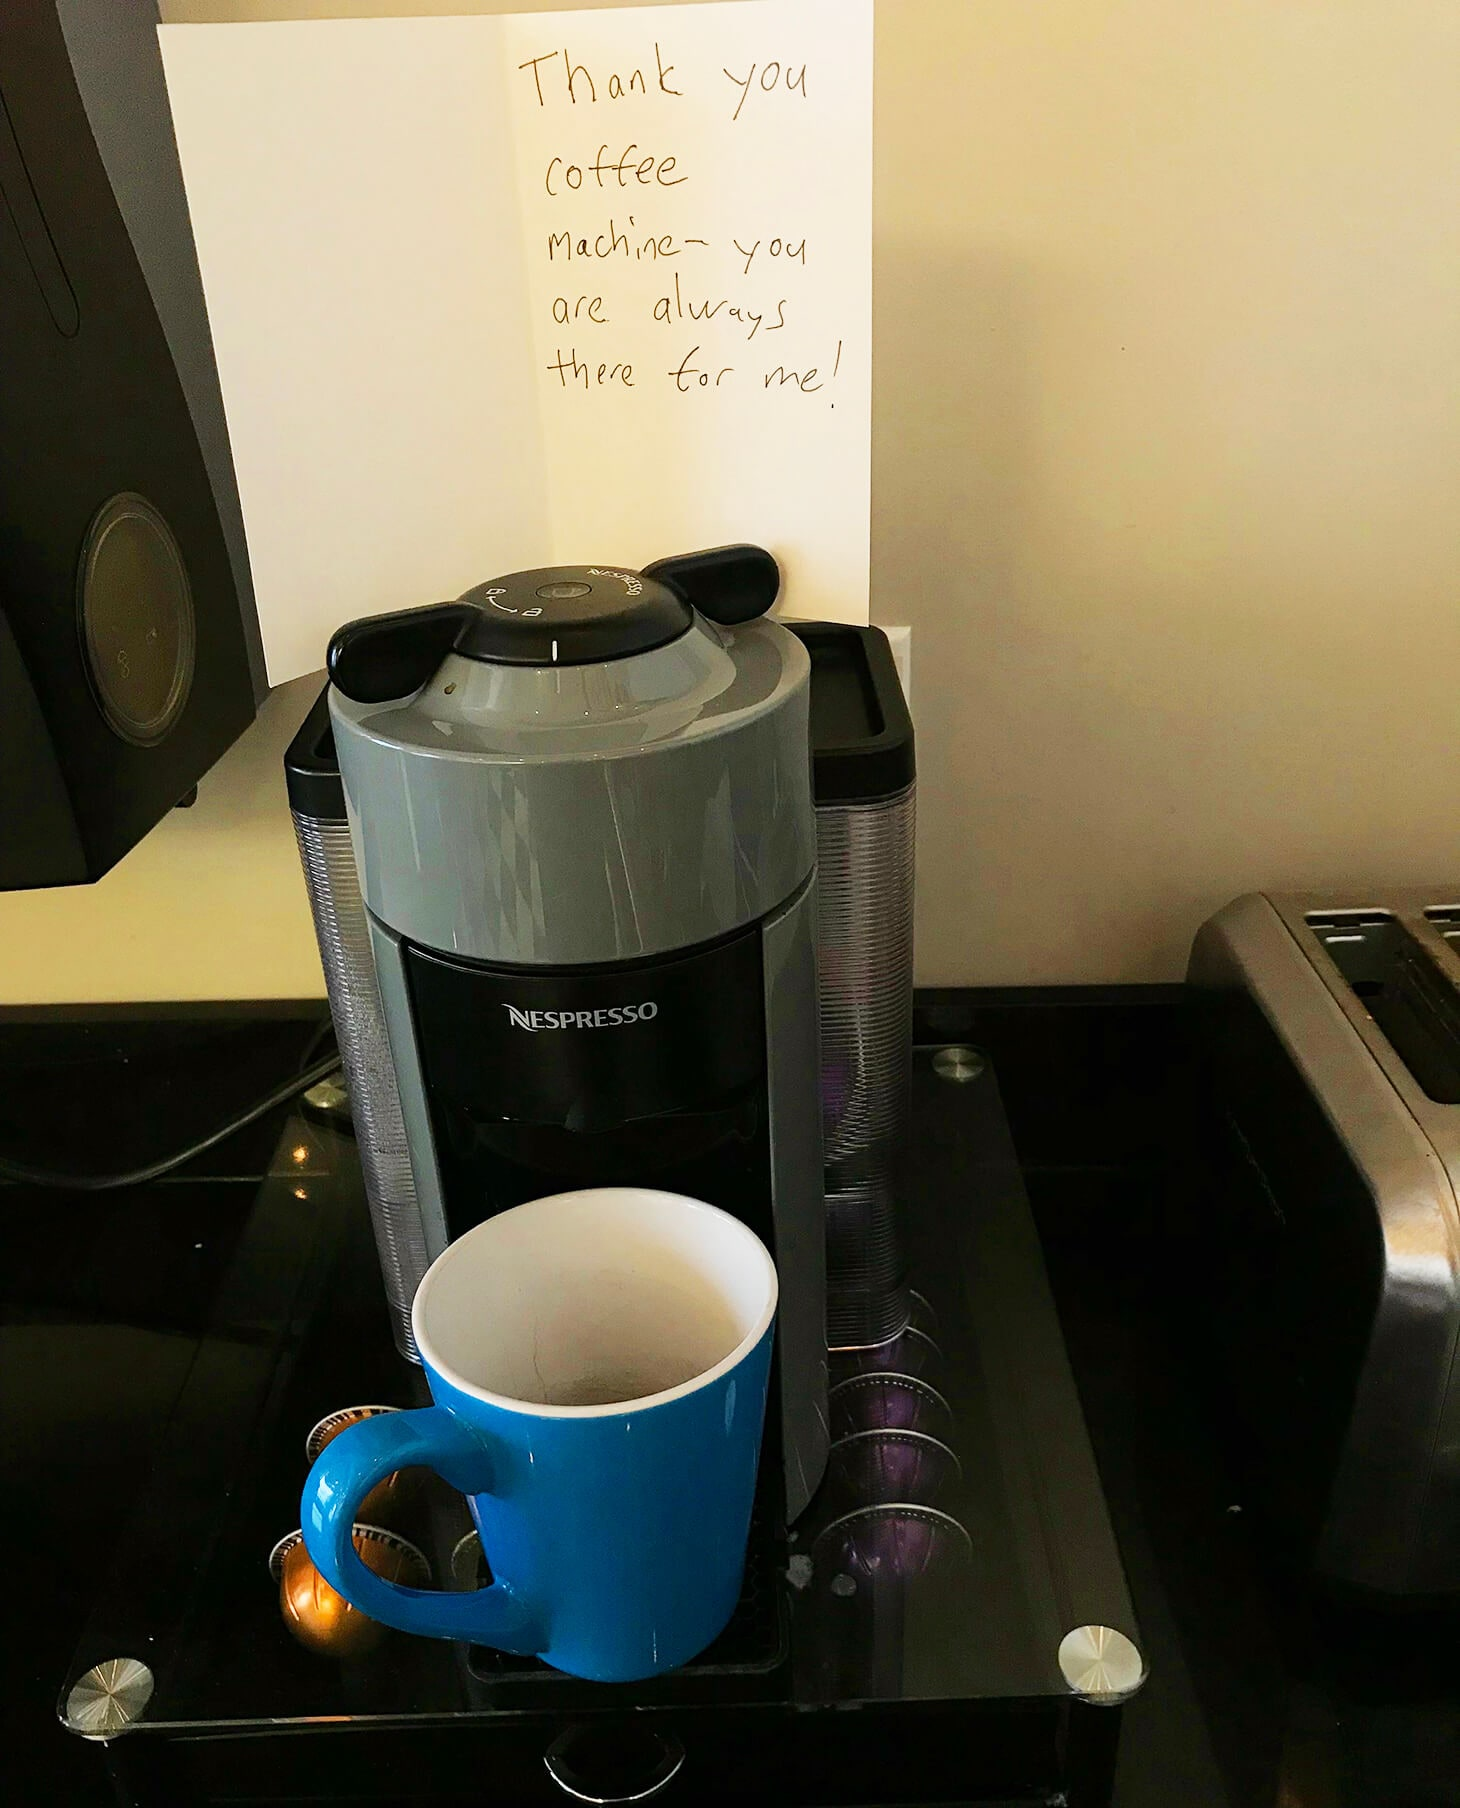 Gratitude to the coffee